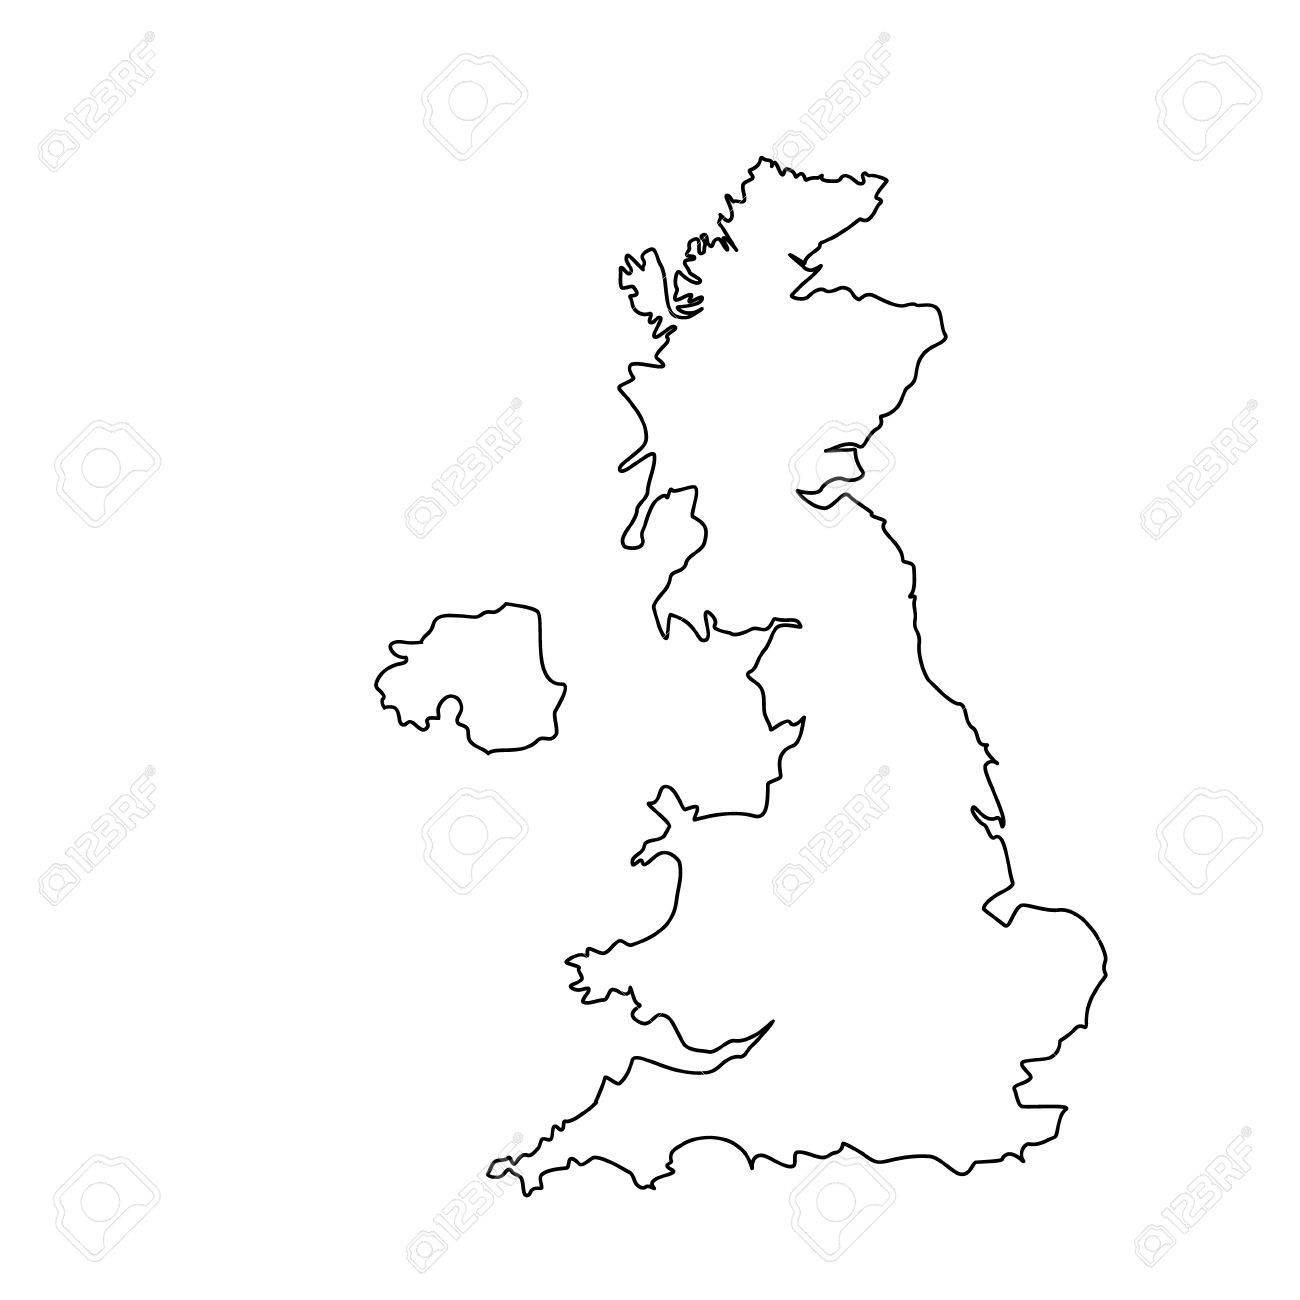 Uk Map Outline Raster Illustration Uk Map Outline Drawing. England Map Line  Uk Map Outline